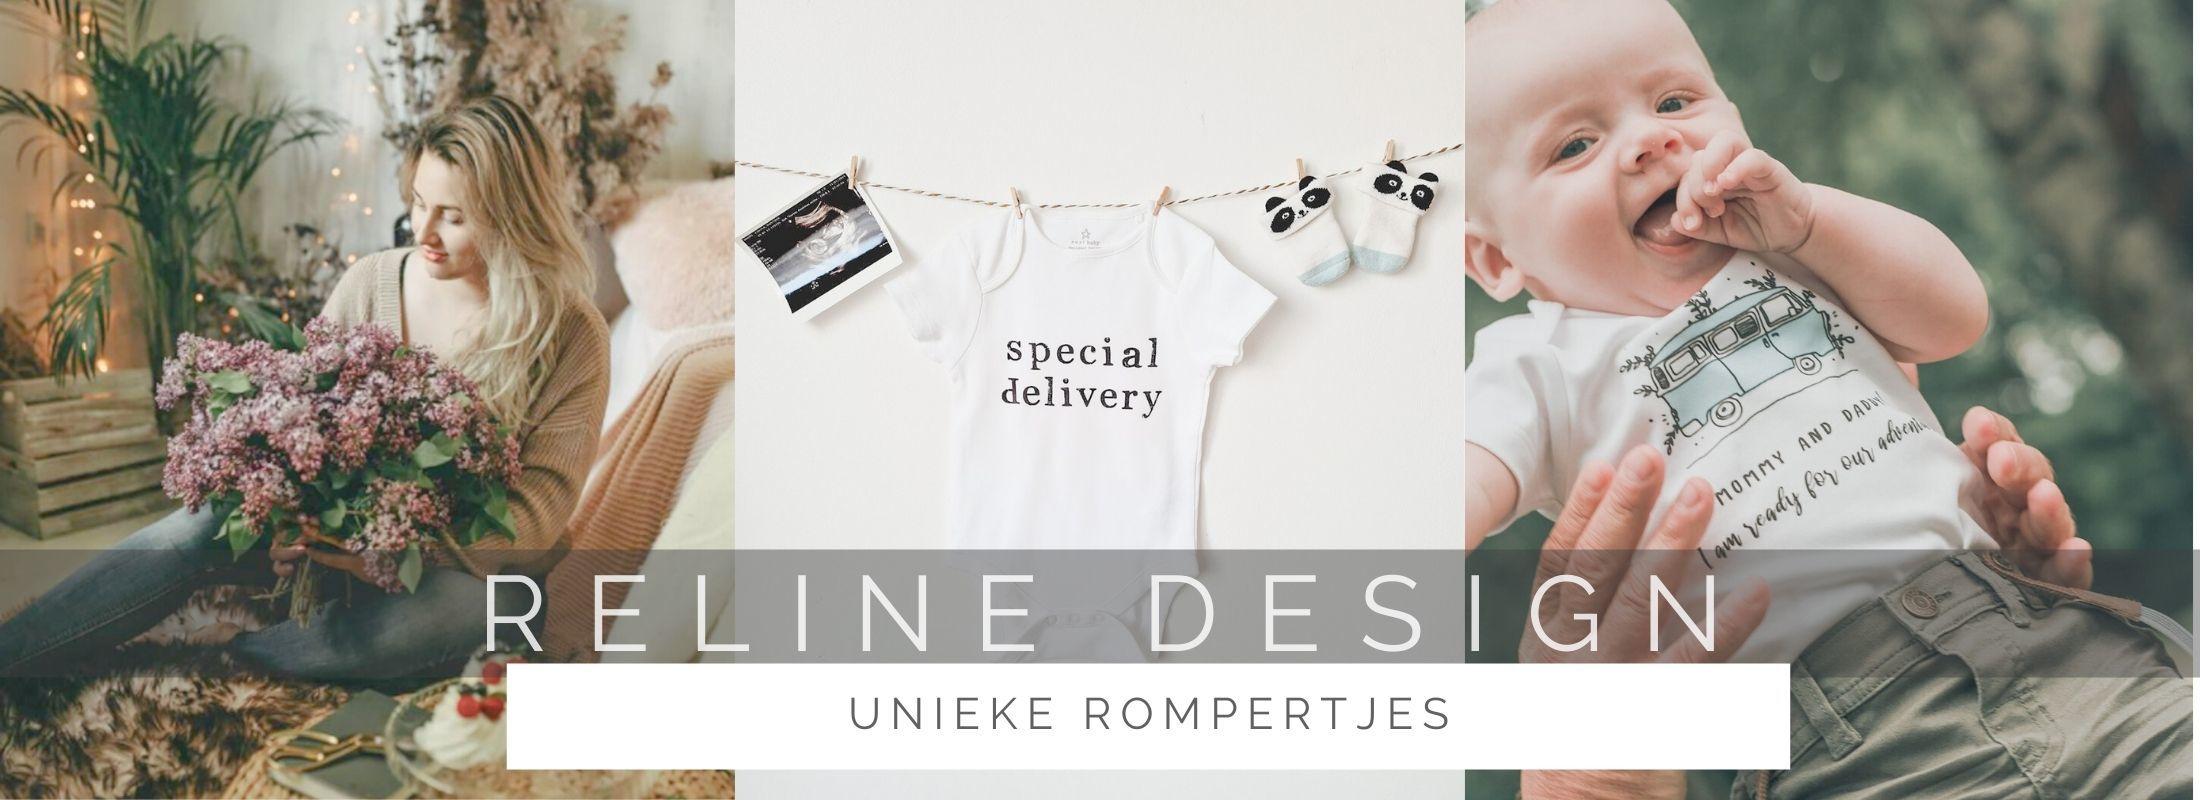 Reline Design